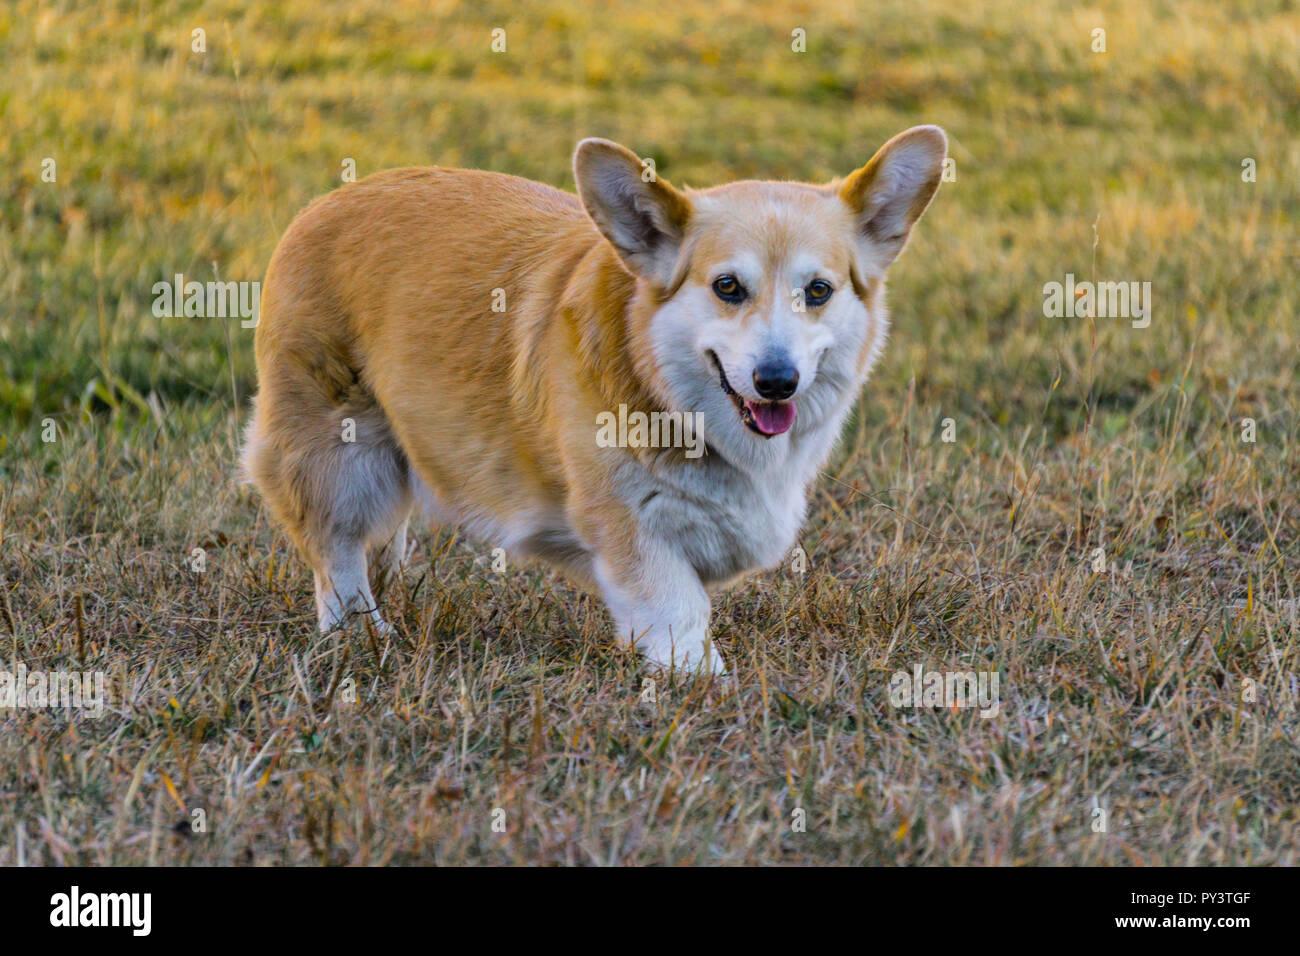 Pembroke welsh corgi dog - Stock Image